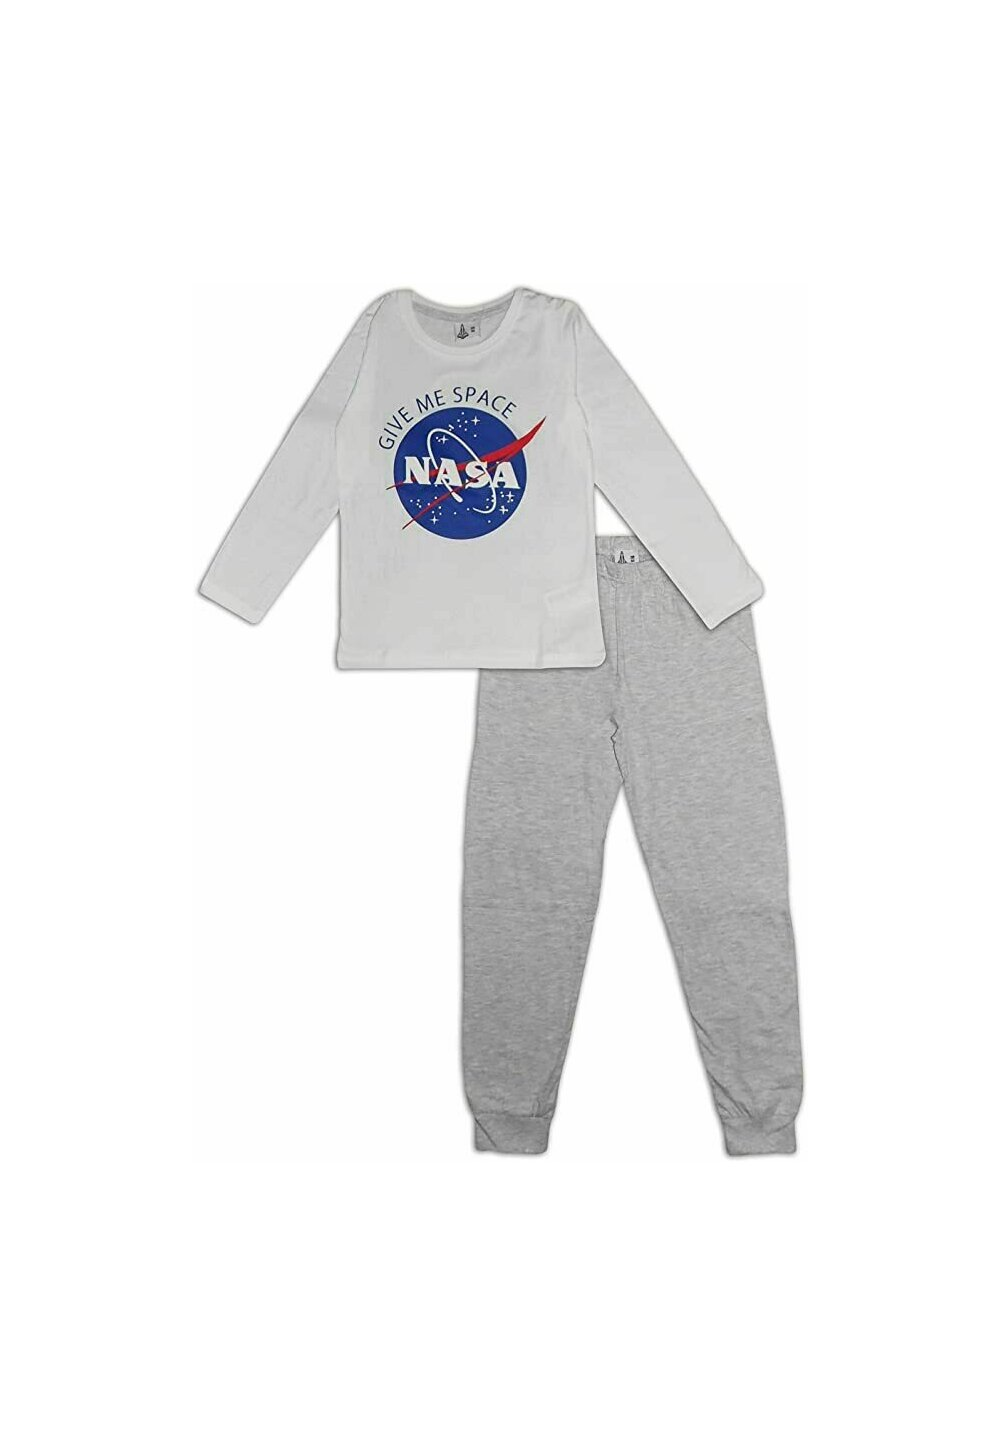 Pijama fete, Nasa Give me space, alba imagine